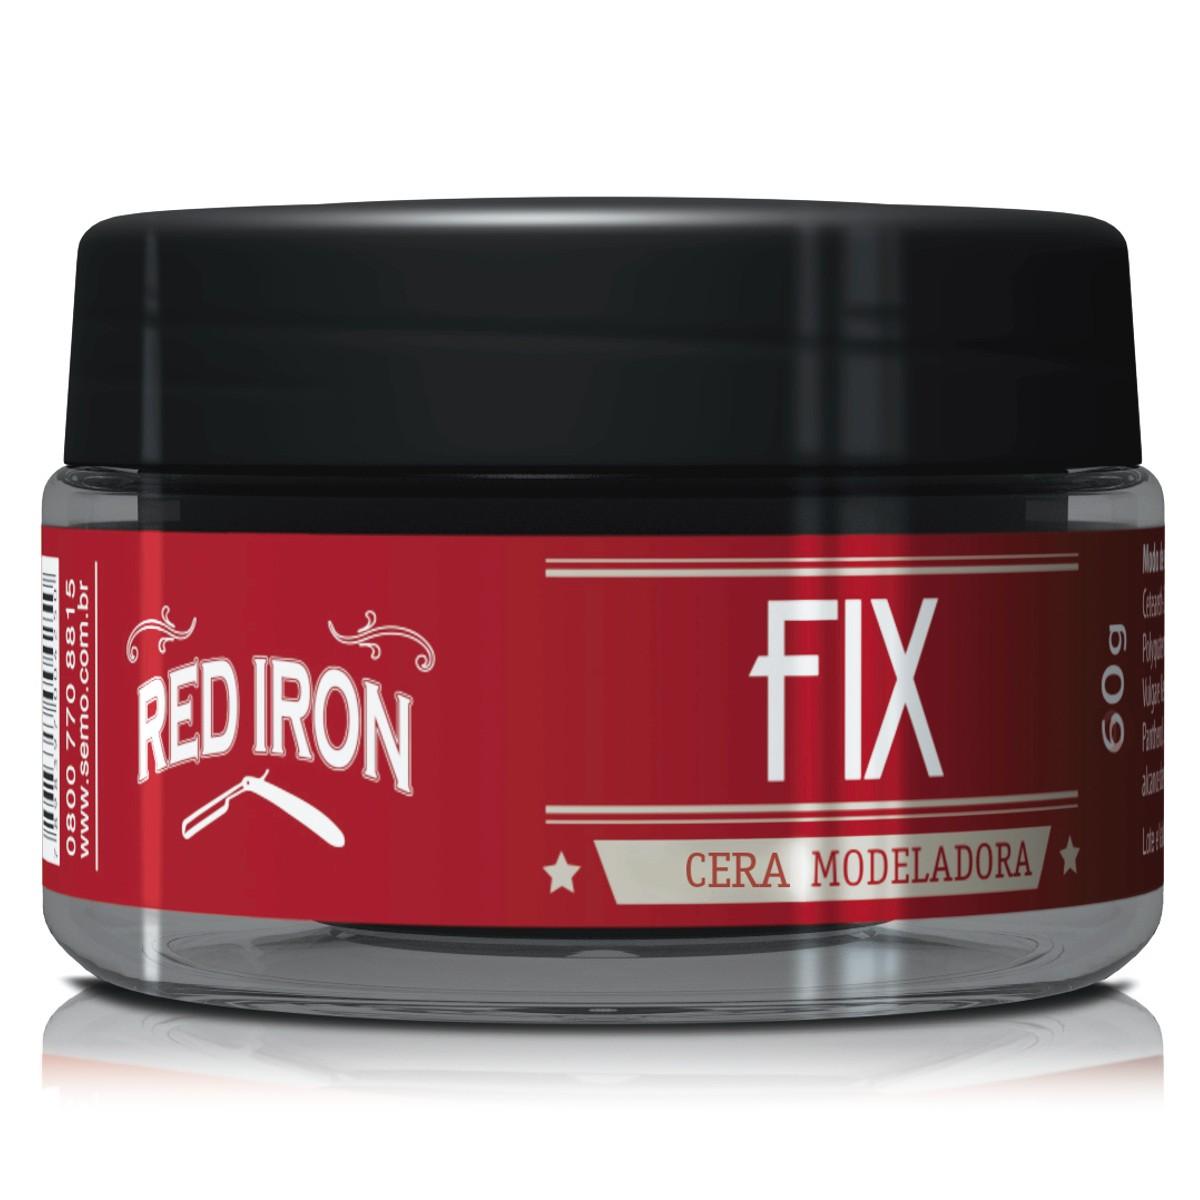 Red Iron Redfix  Wax - Cera Modeladora Para Cabelos 60g